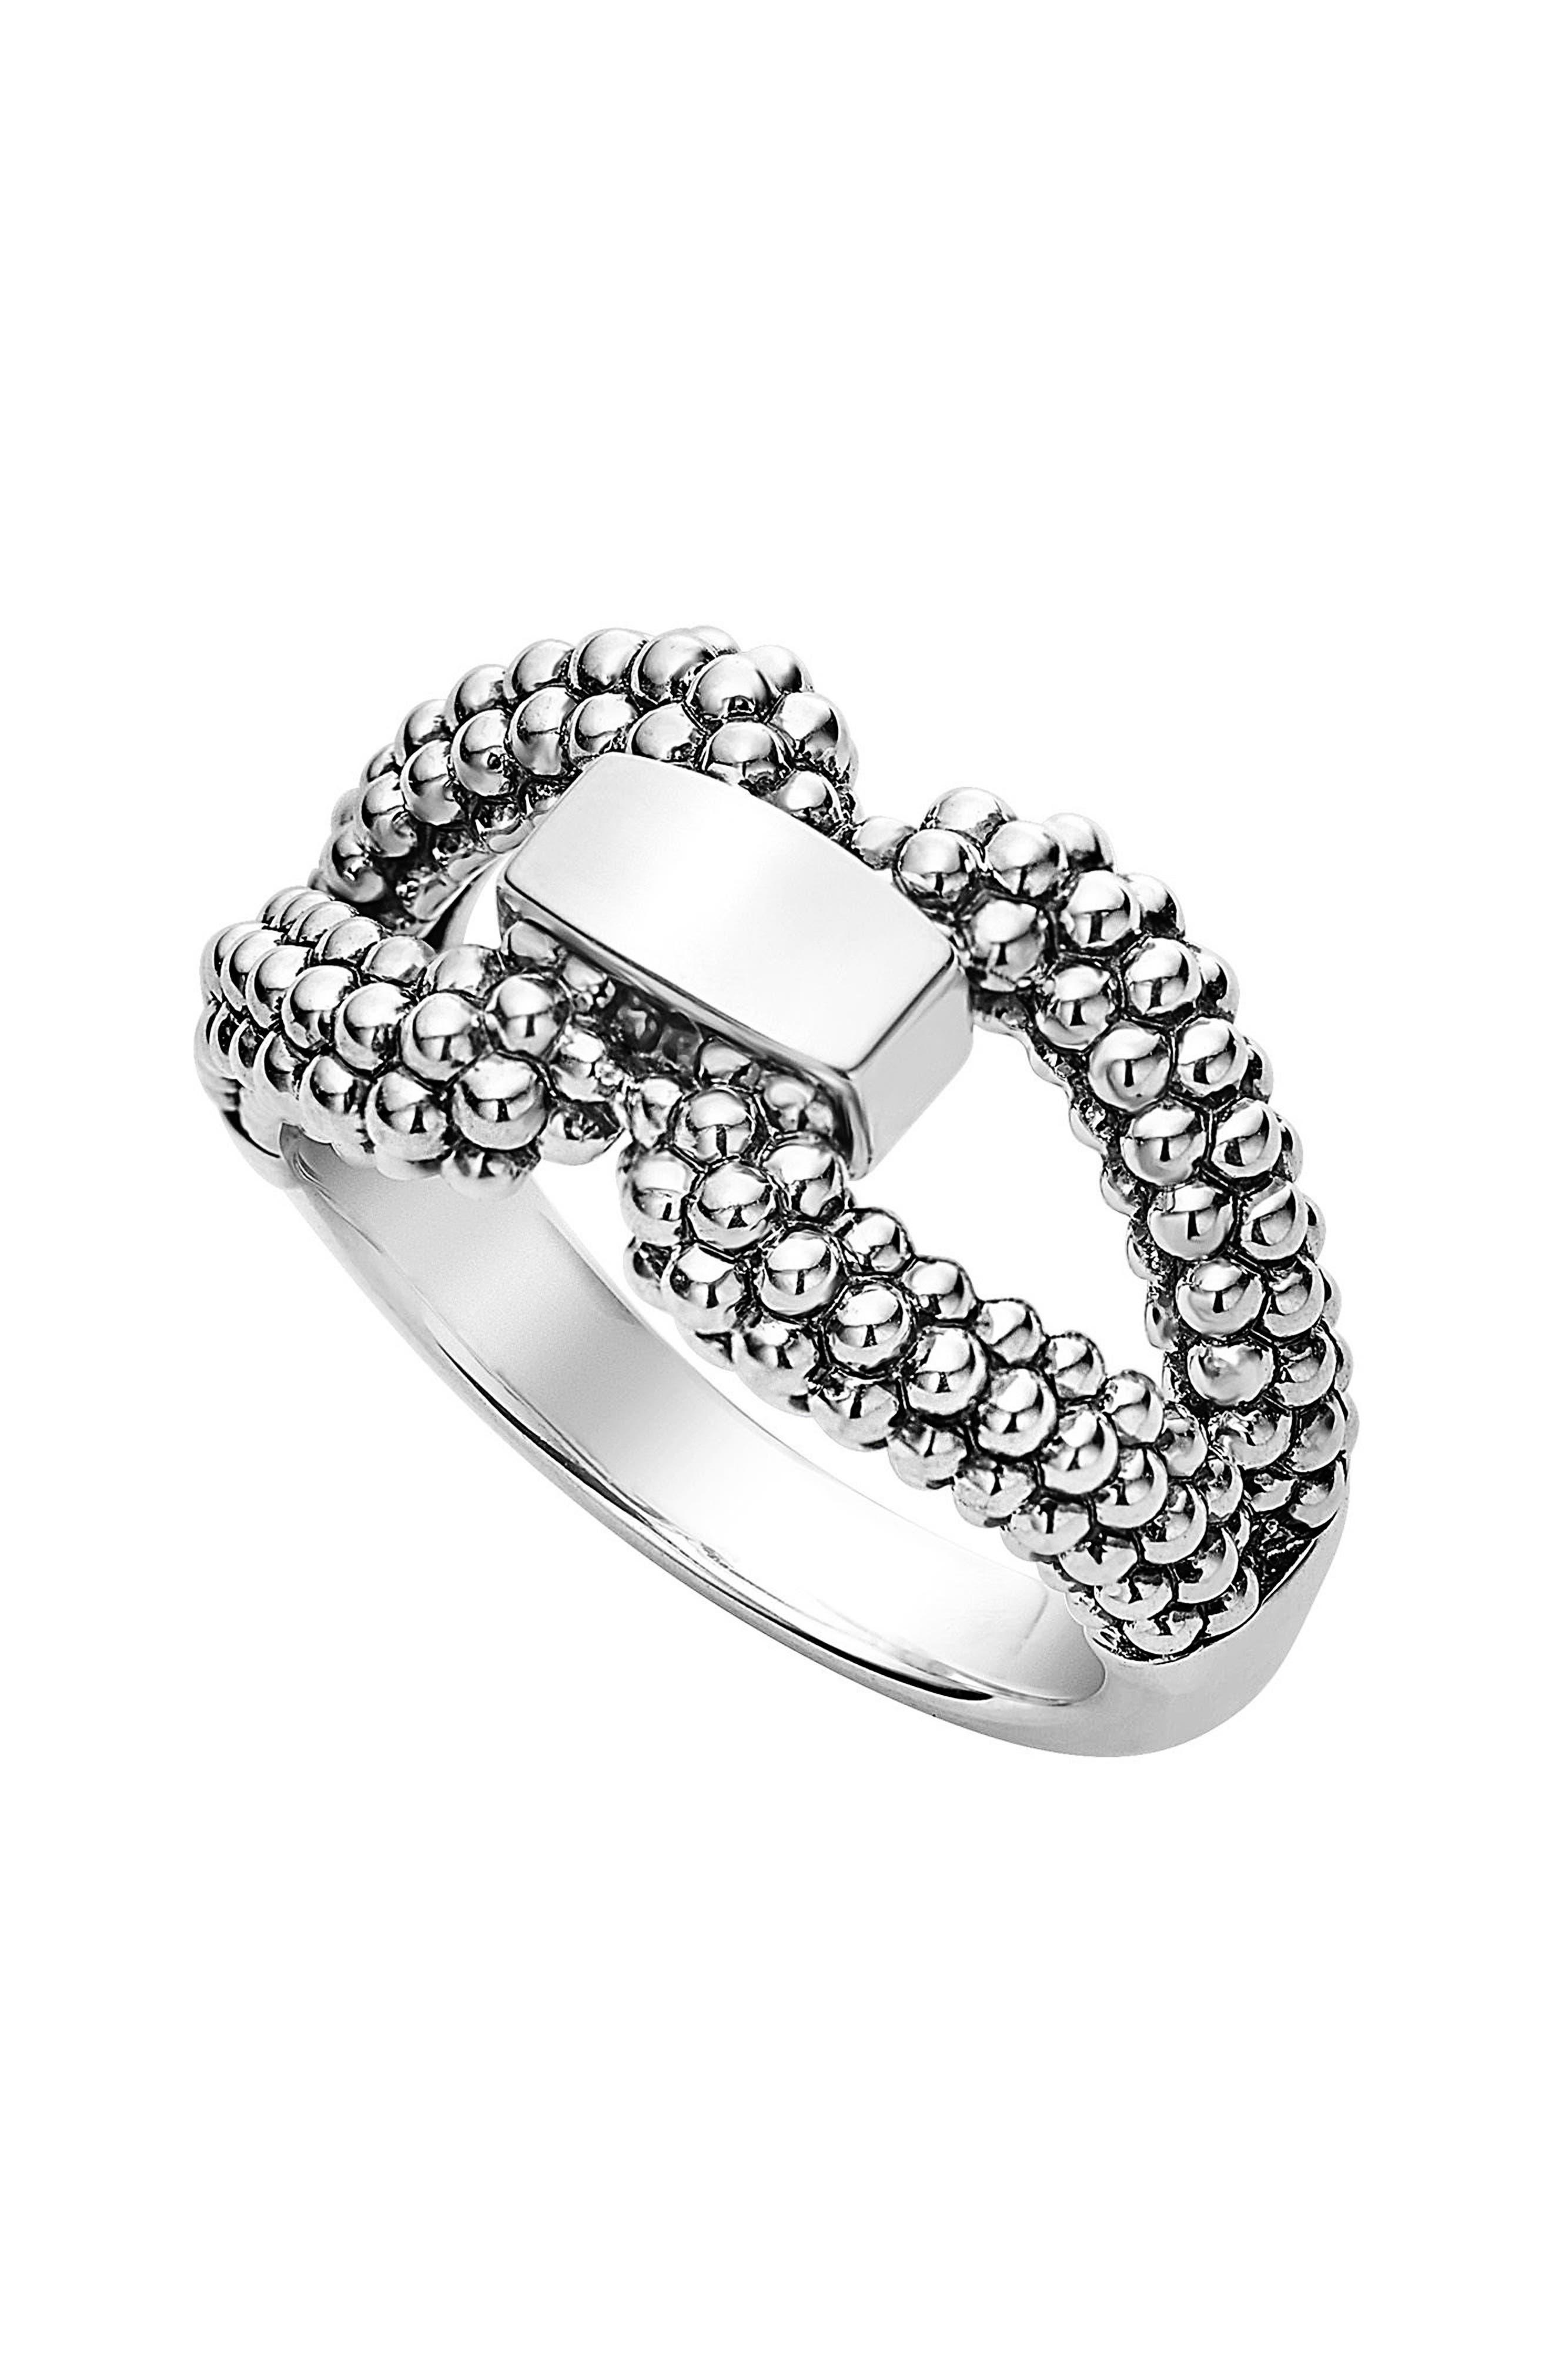 LAGOS Derby Caviar Ring